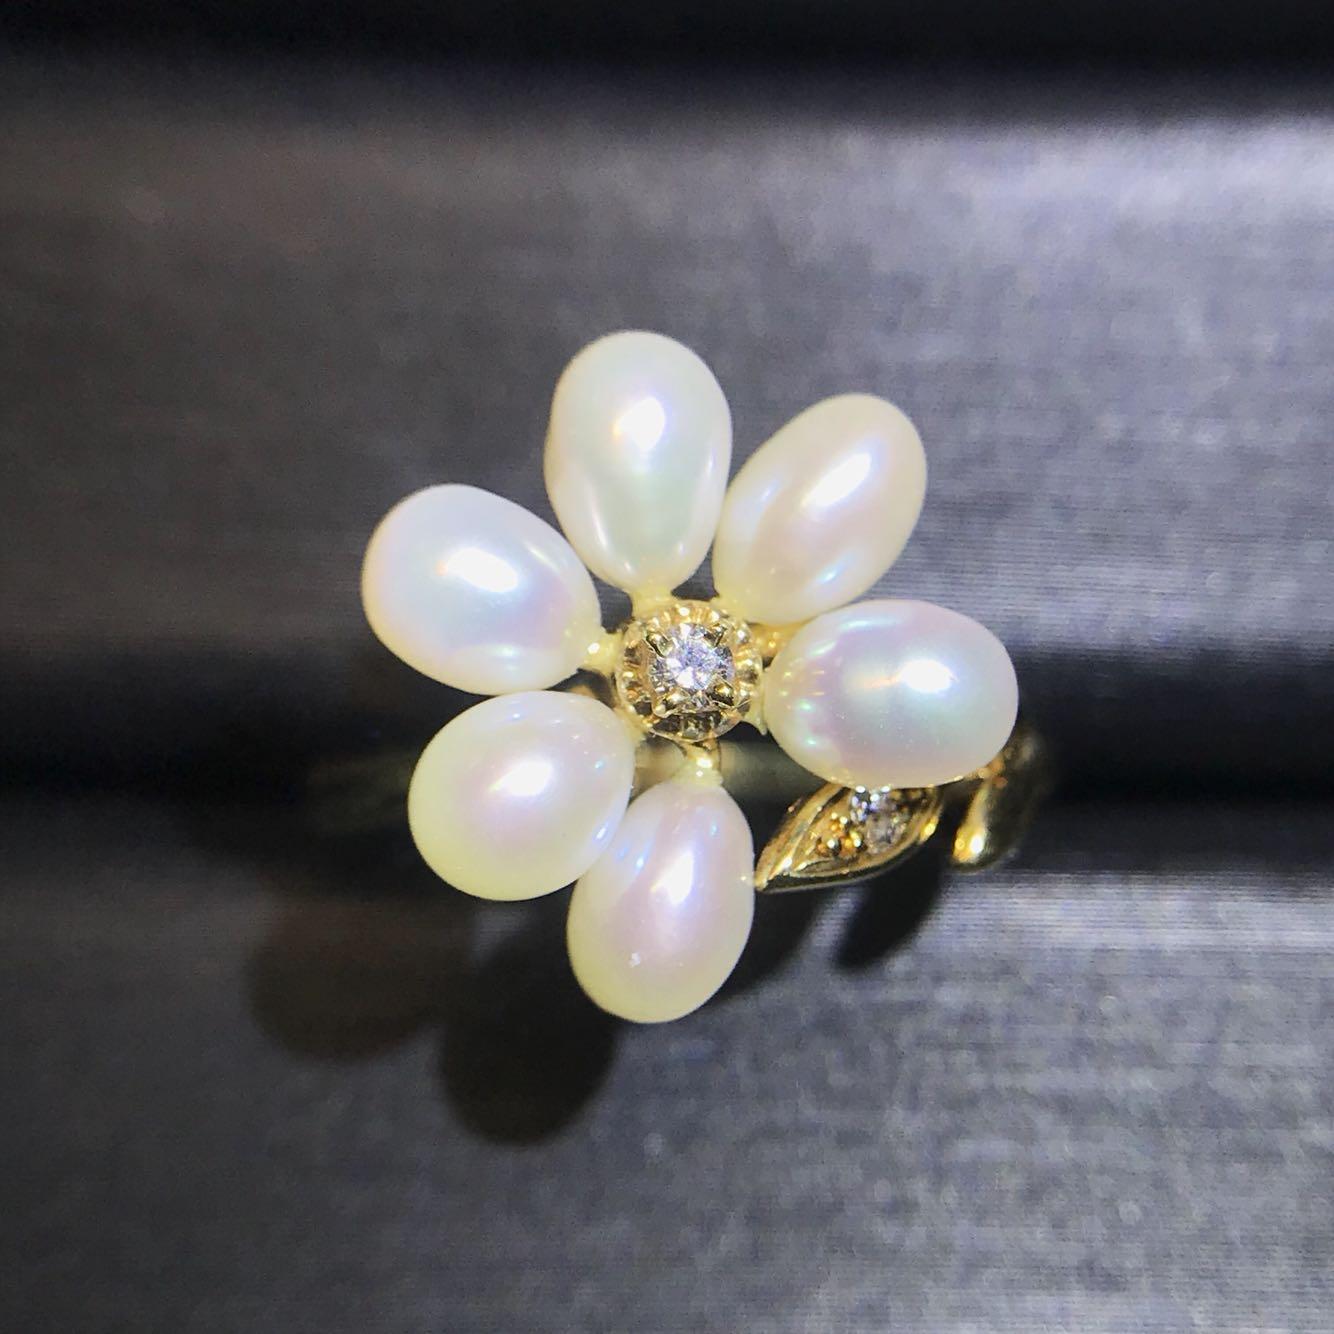 Small fresh and lovely pearl diamond ring, an elegant blooming flower, looks versatile